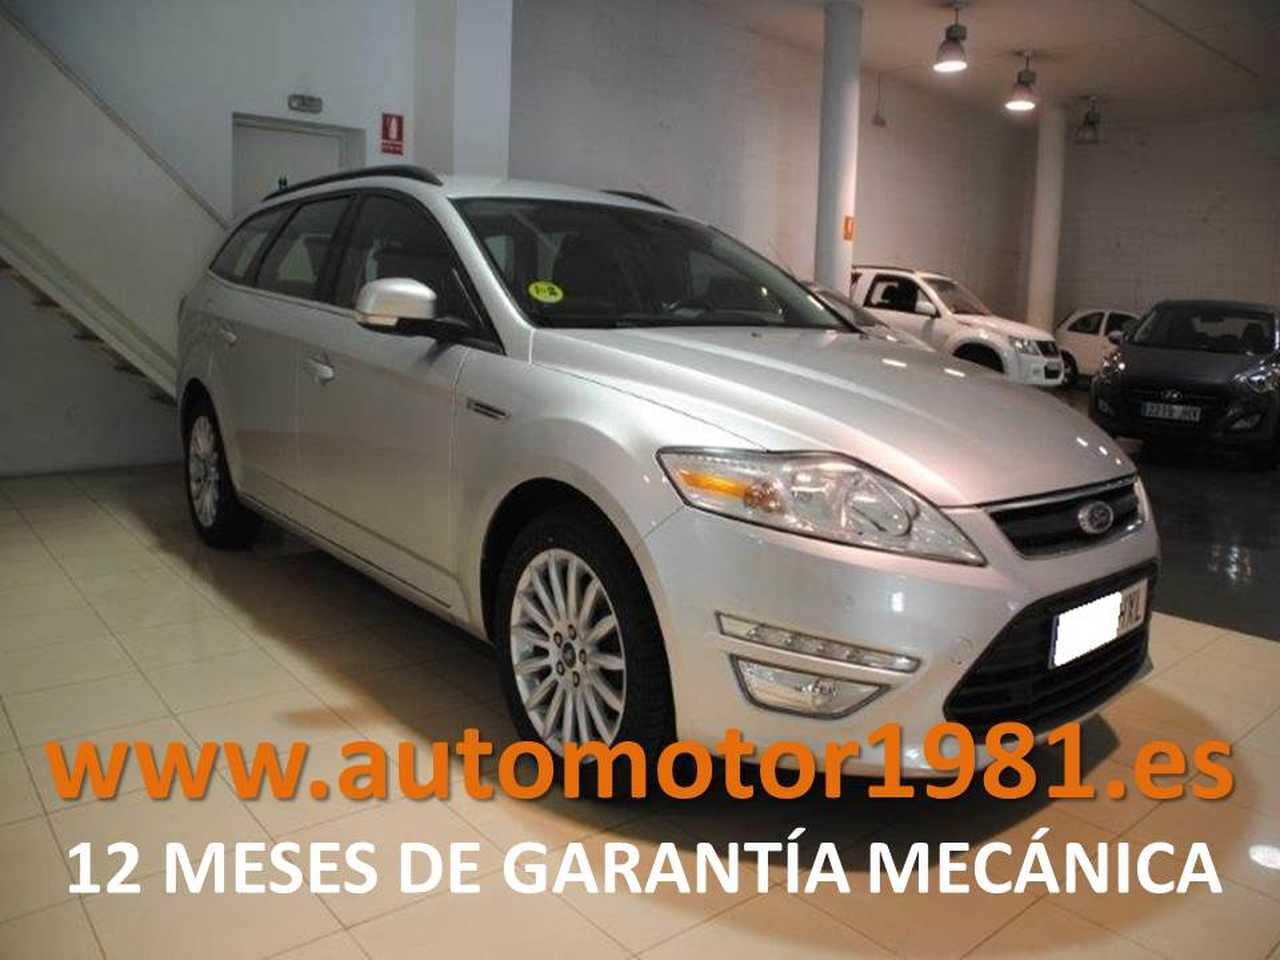 Ford Mondeo SB 1.6TDCi Limited Edition - 12 MESES GARANTIA MECANICA  - Foto 1